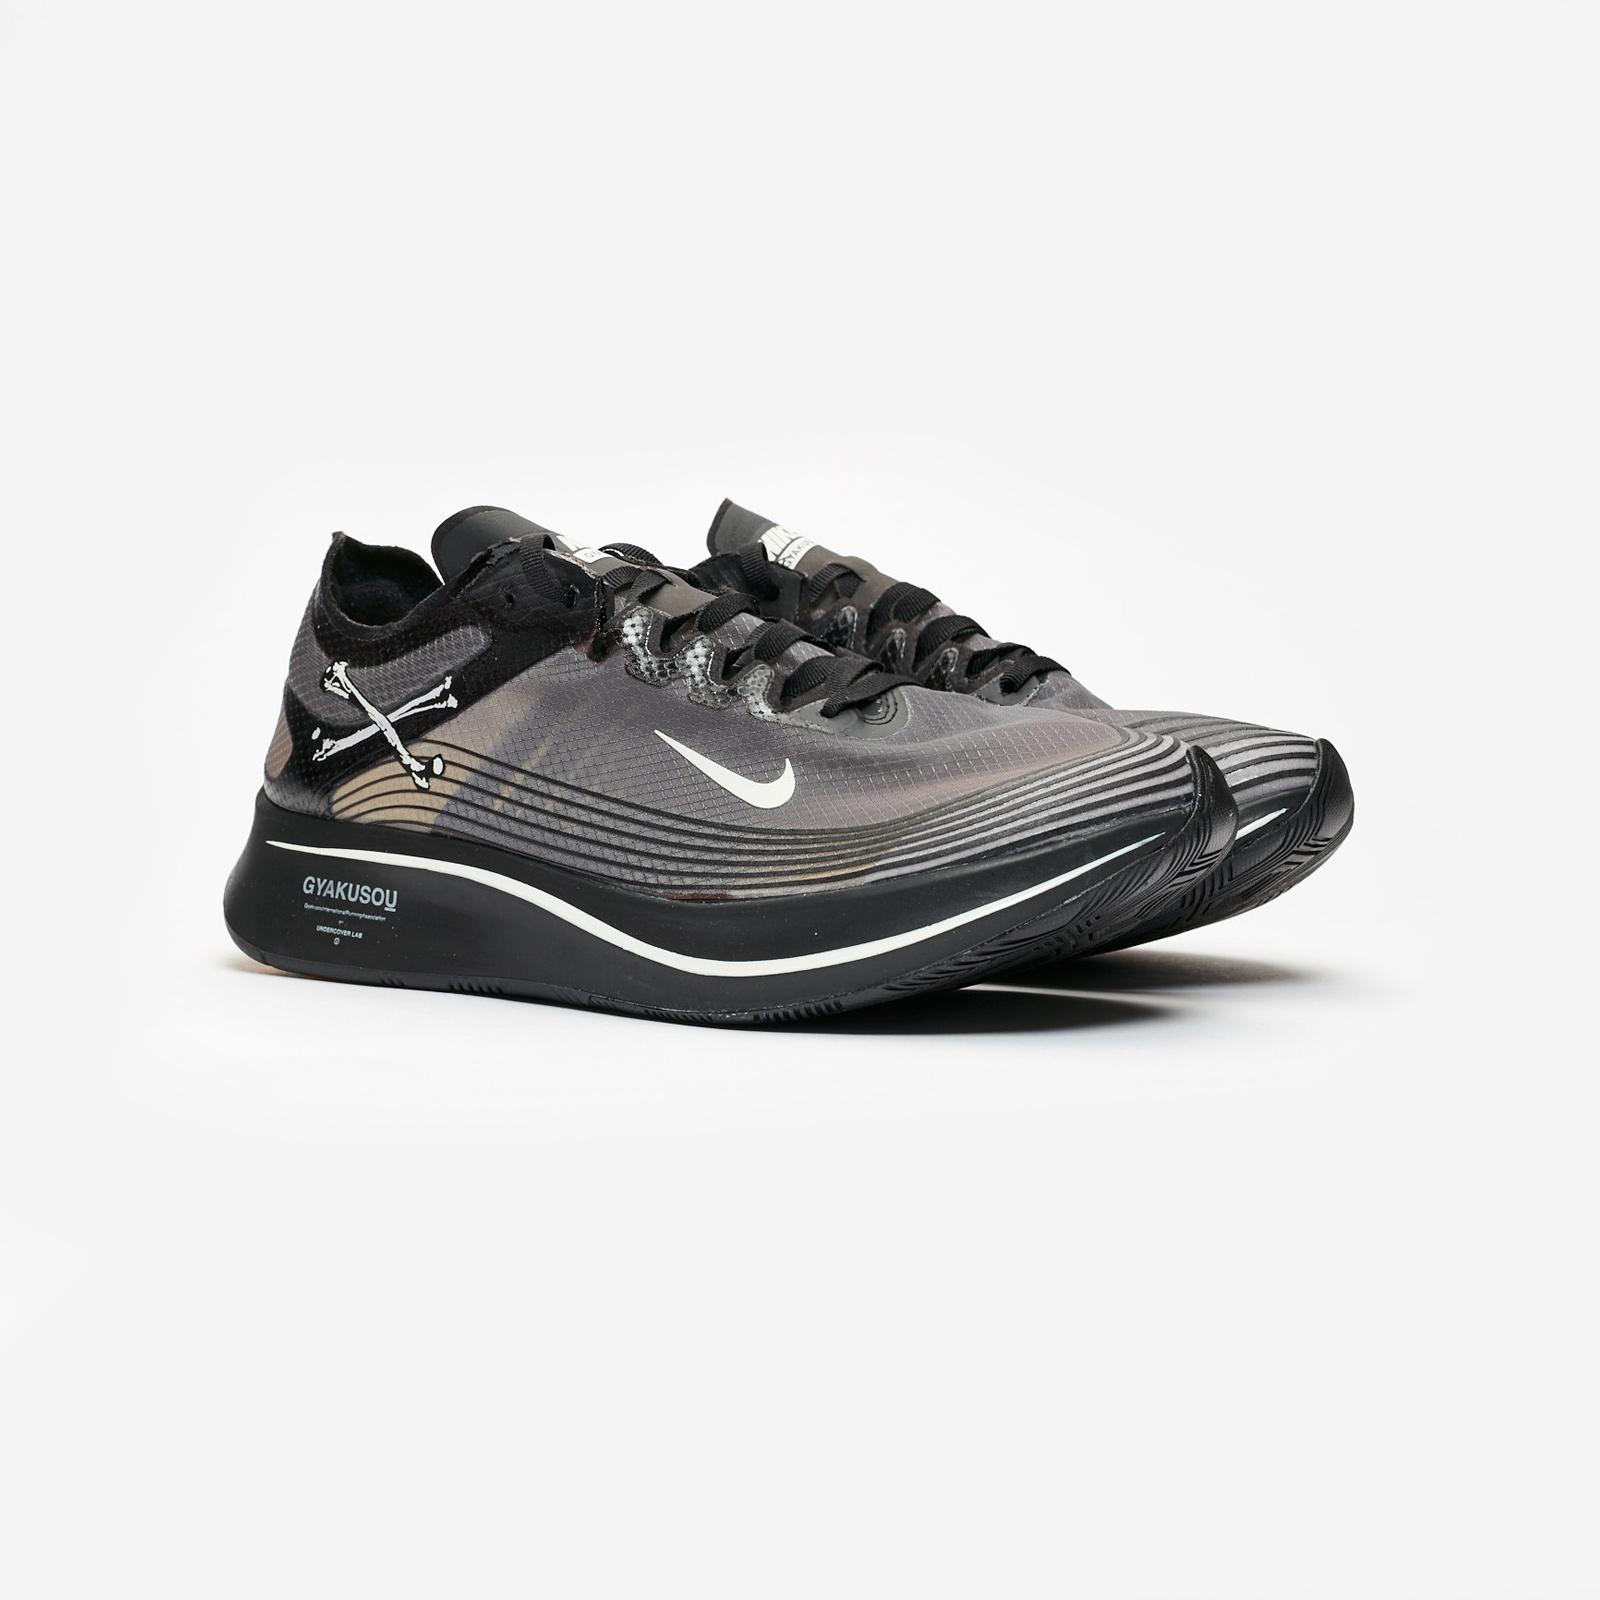 1c9e346560248 Nike Zoom Fly   Gyakusou - Ar4349-001 - Sneakersnstuff